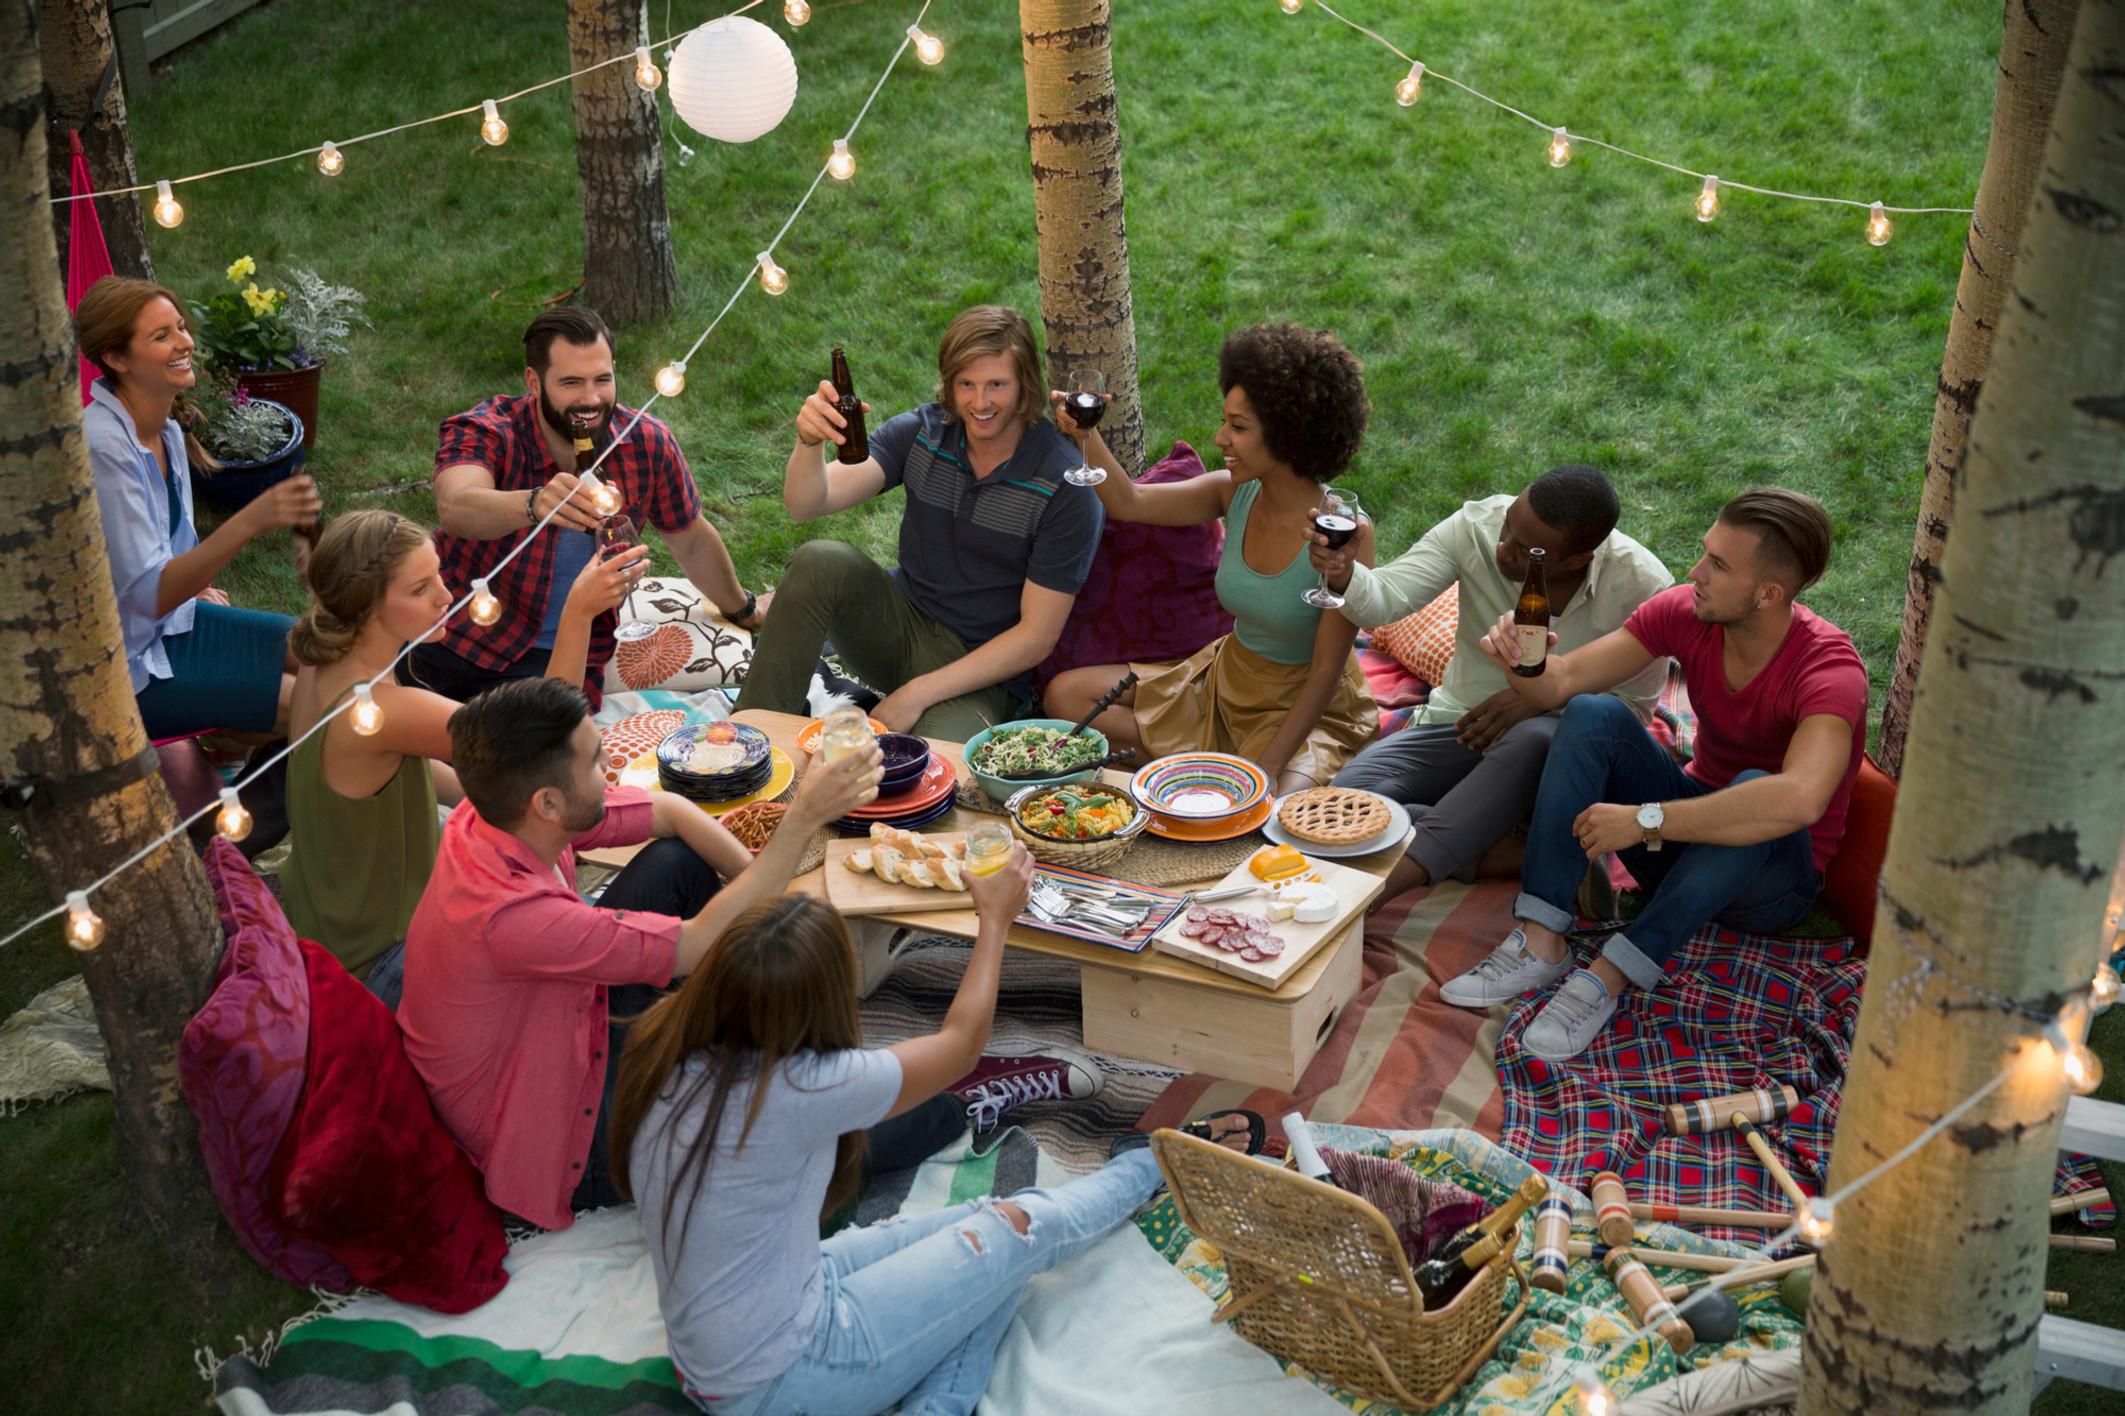 Speaking Engagements & Group Readings